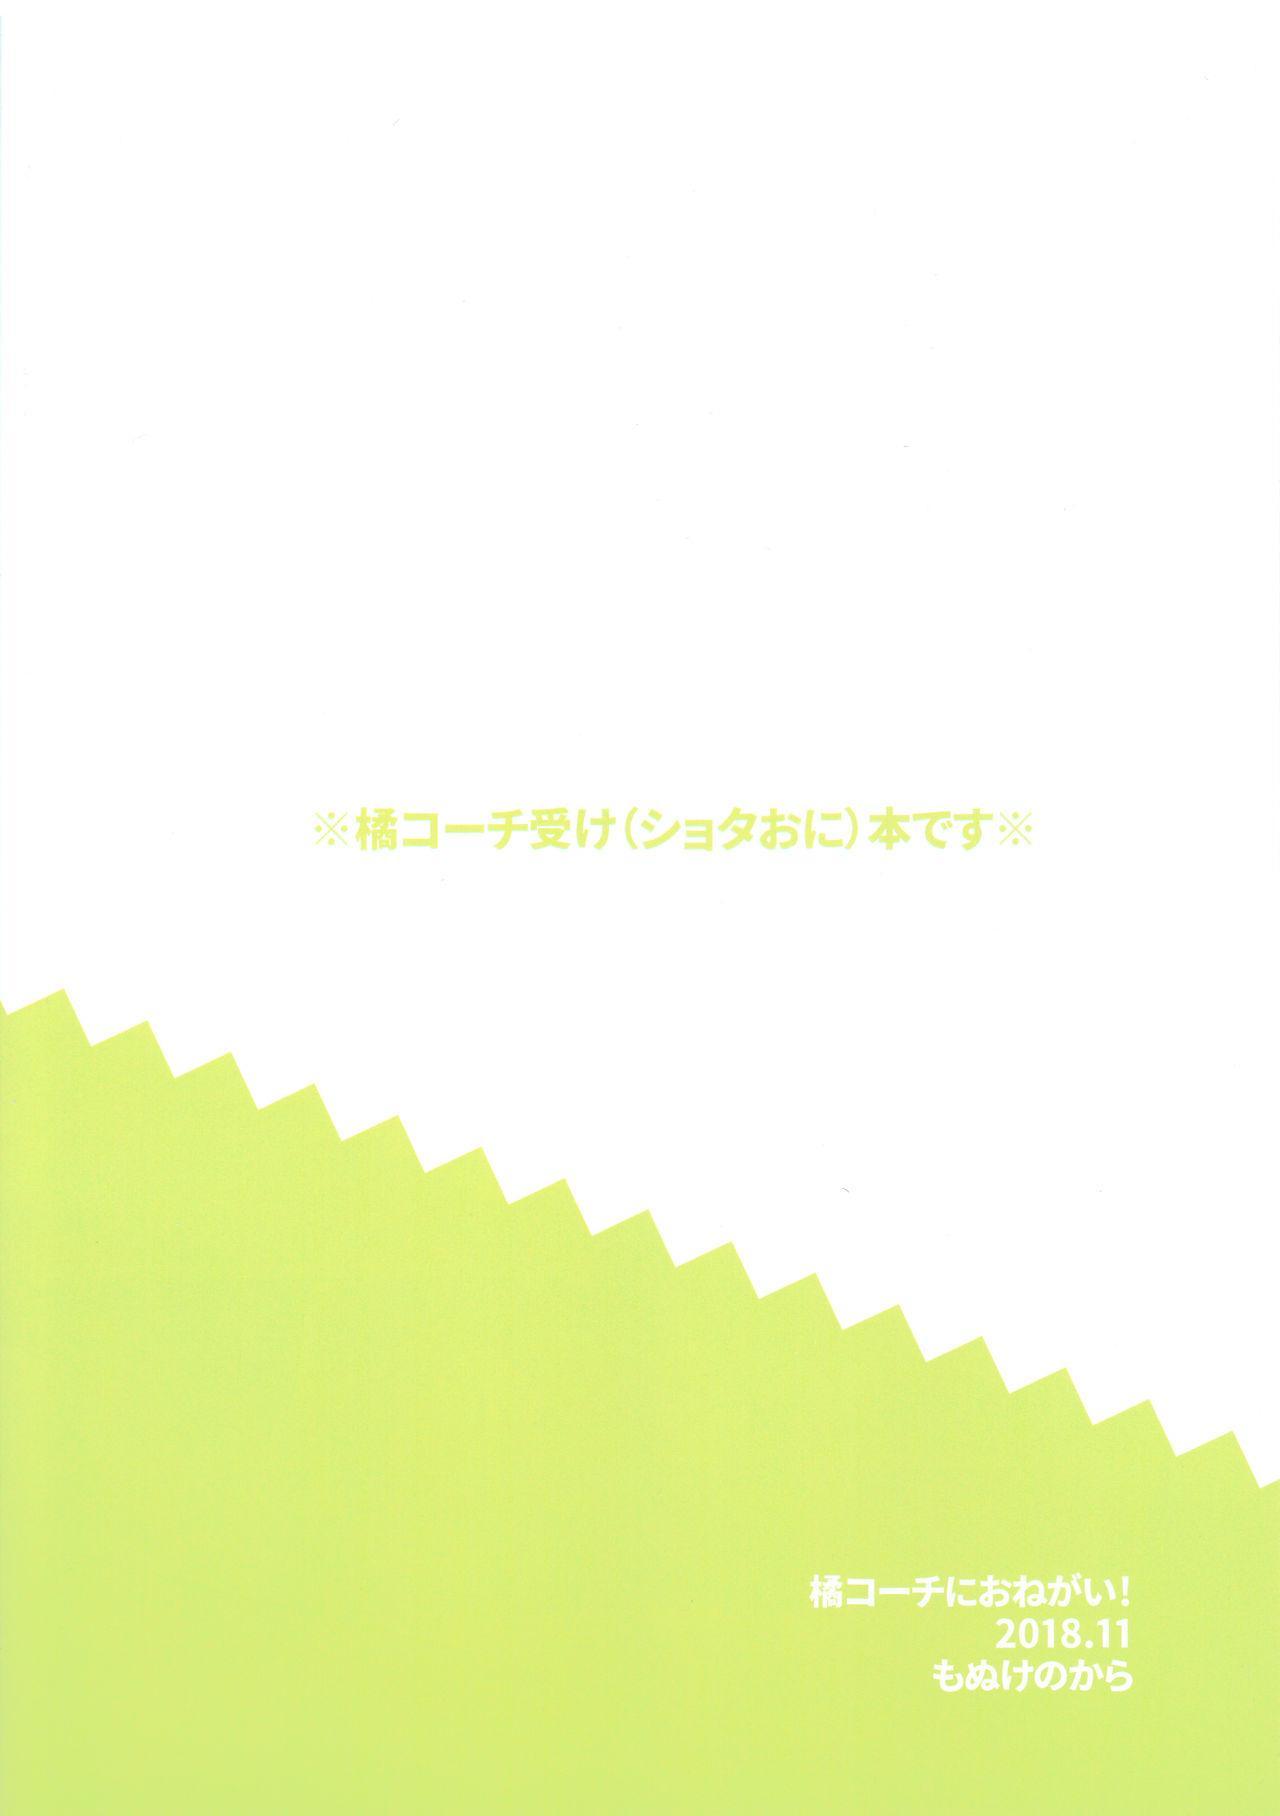 Makoto Coach ni Onegai! | Please, Coach Makoto! 25